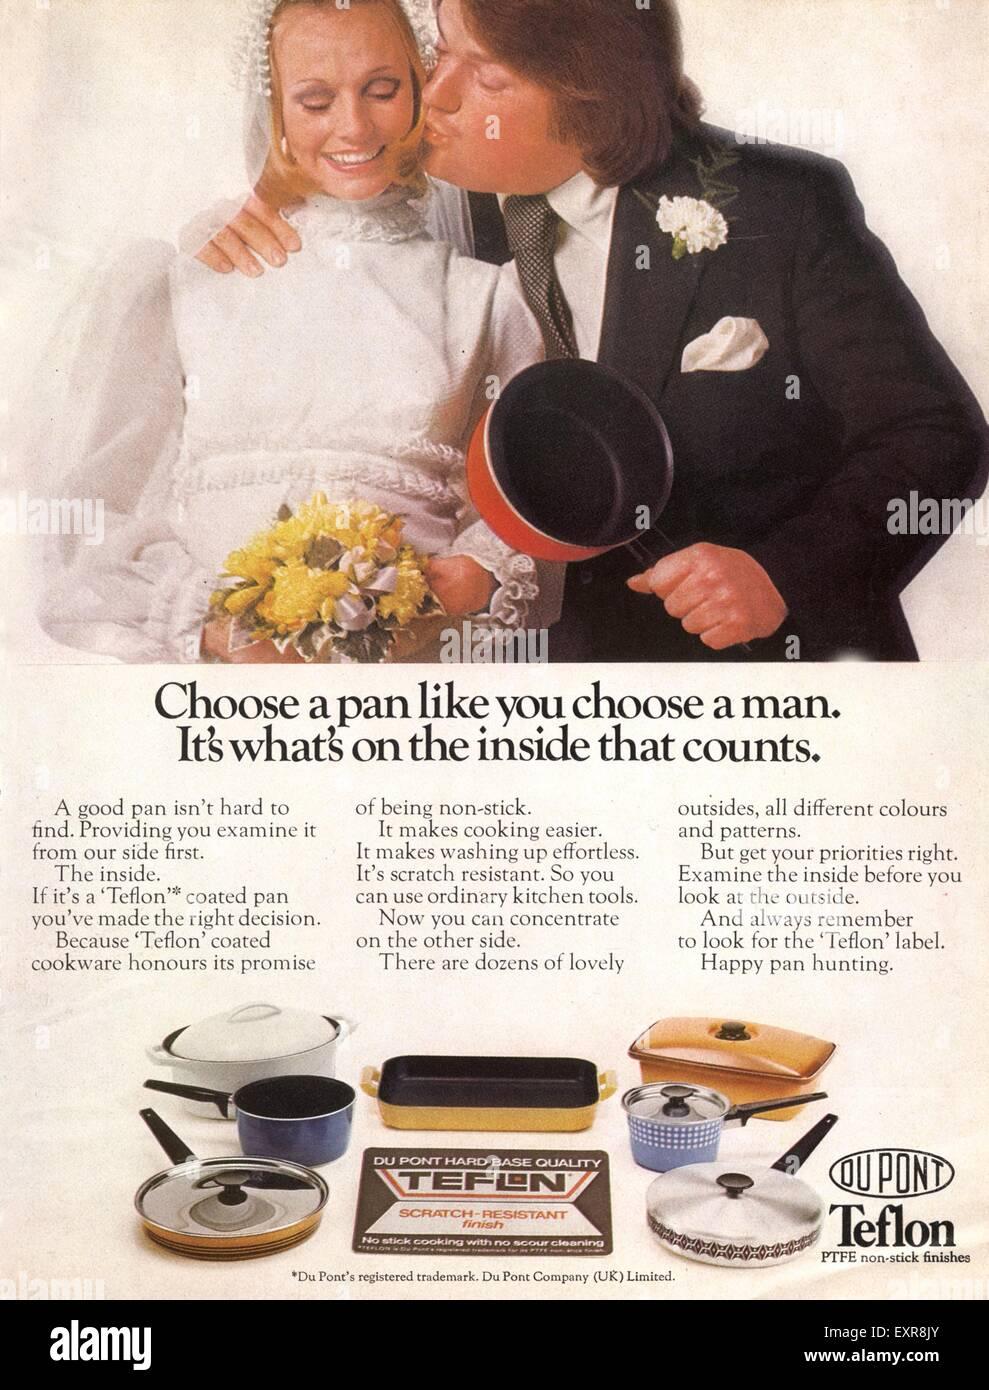 1970s UK Teflon Saucepans Magazine Advert - Stock Image